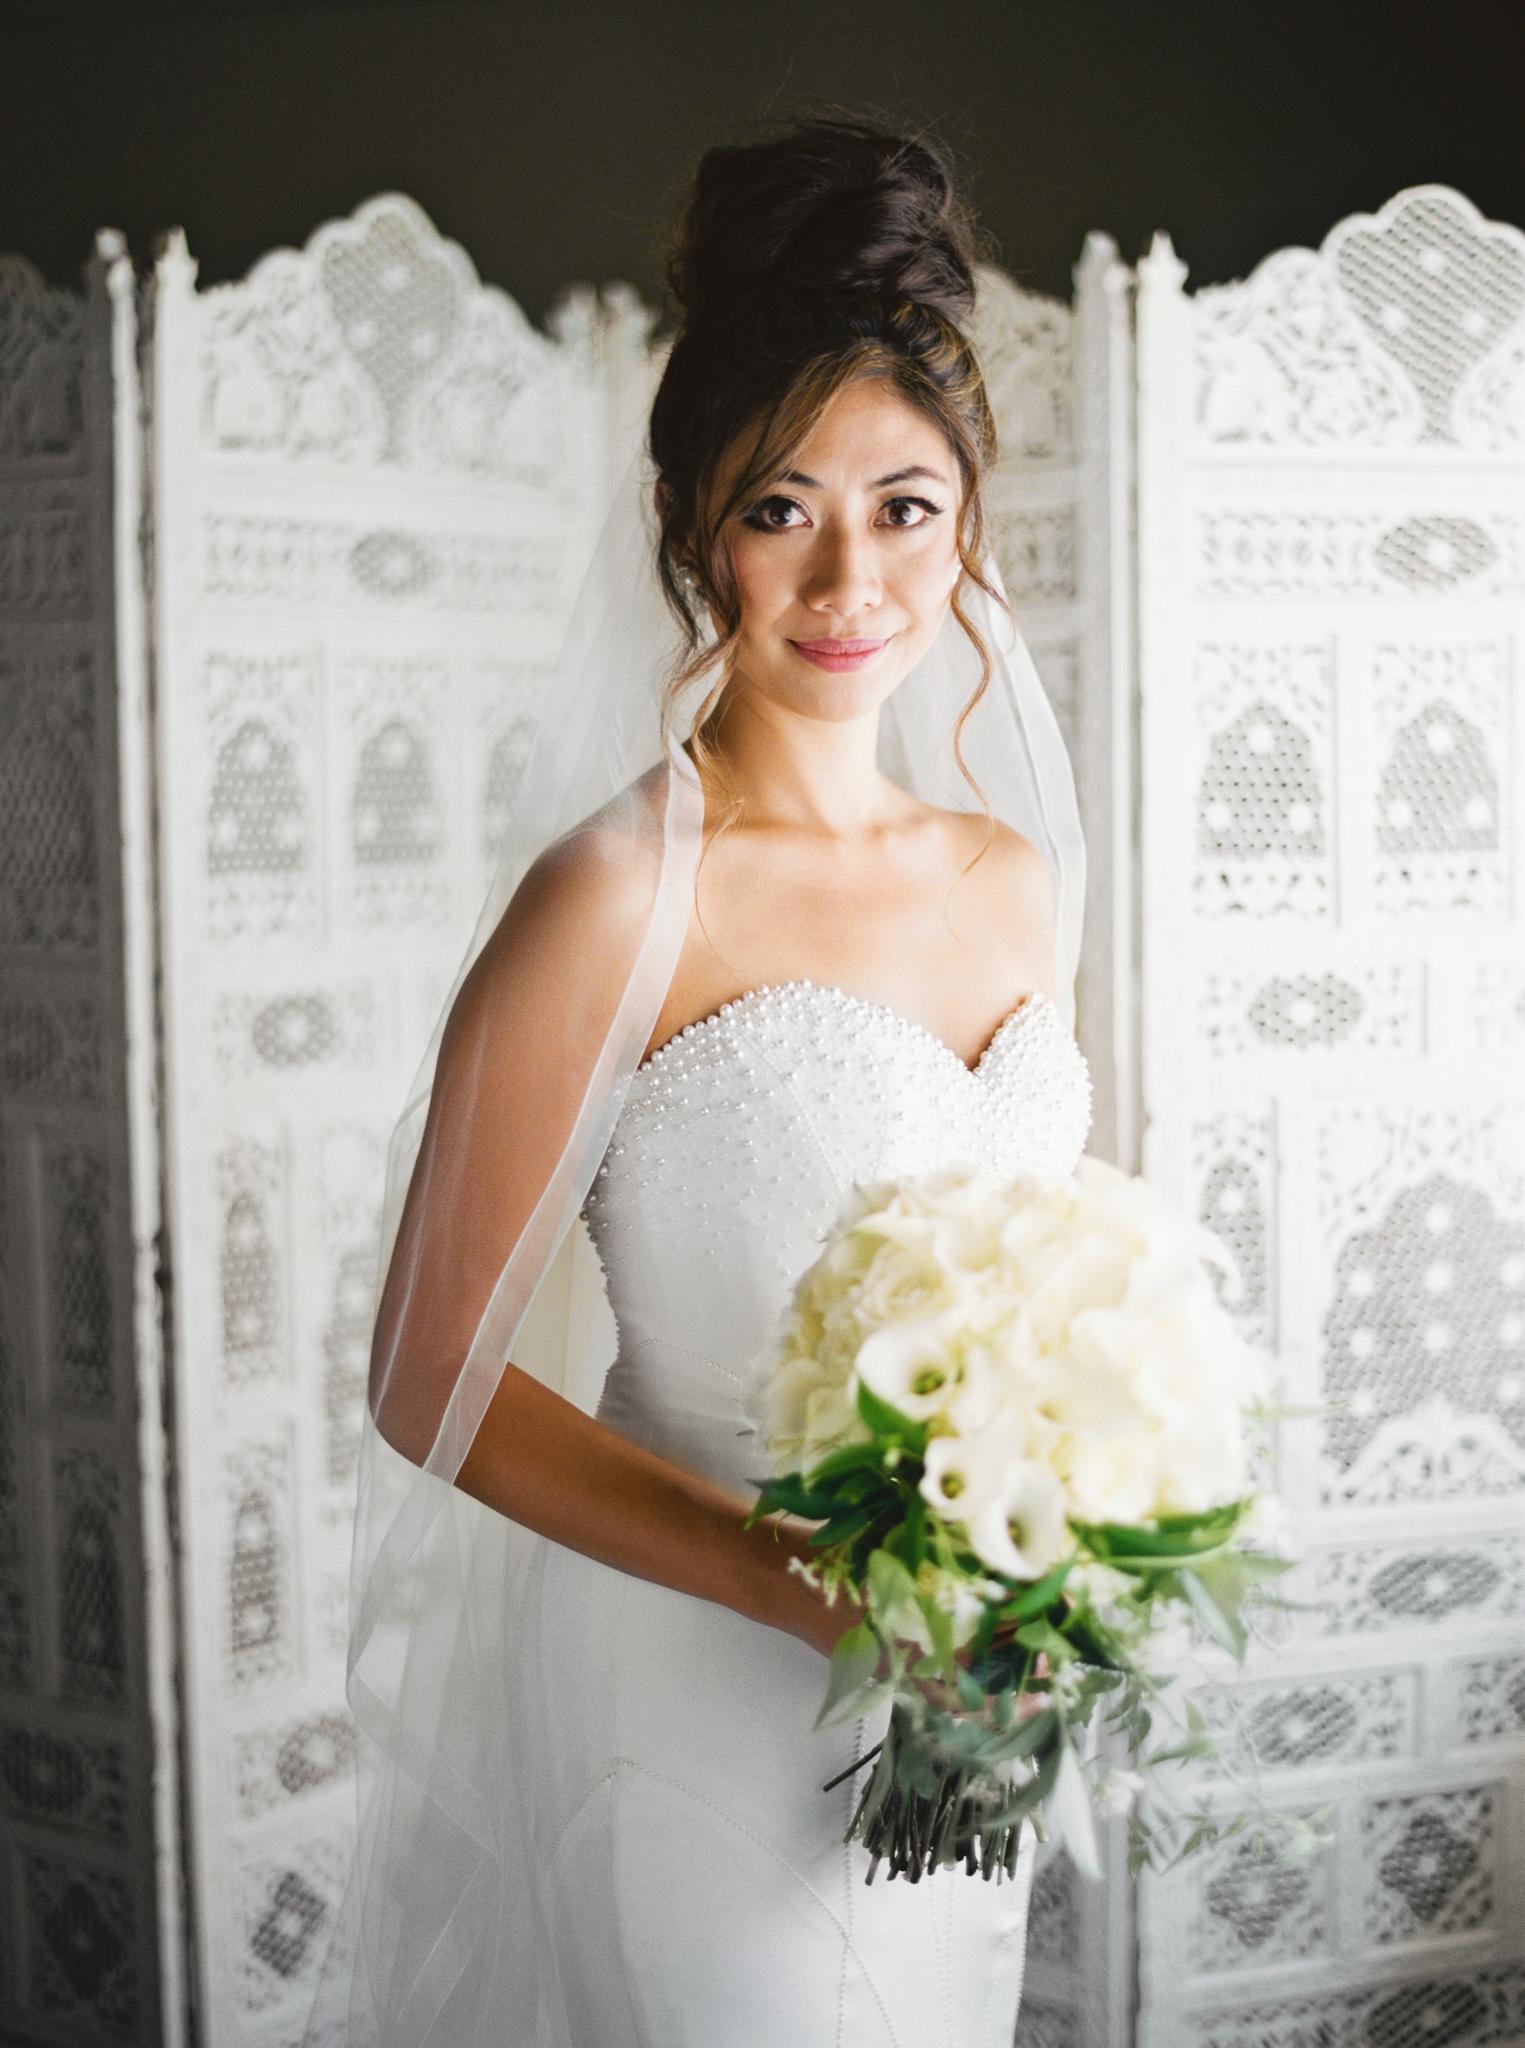 020OutliveCreative_Travel_Photographer_Videographer_Lewis&Clark_Oregon_Elegant_BlackTie_Destination_Wedding.jpg